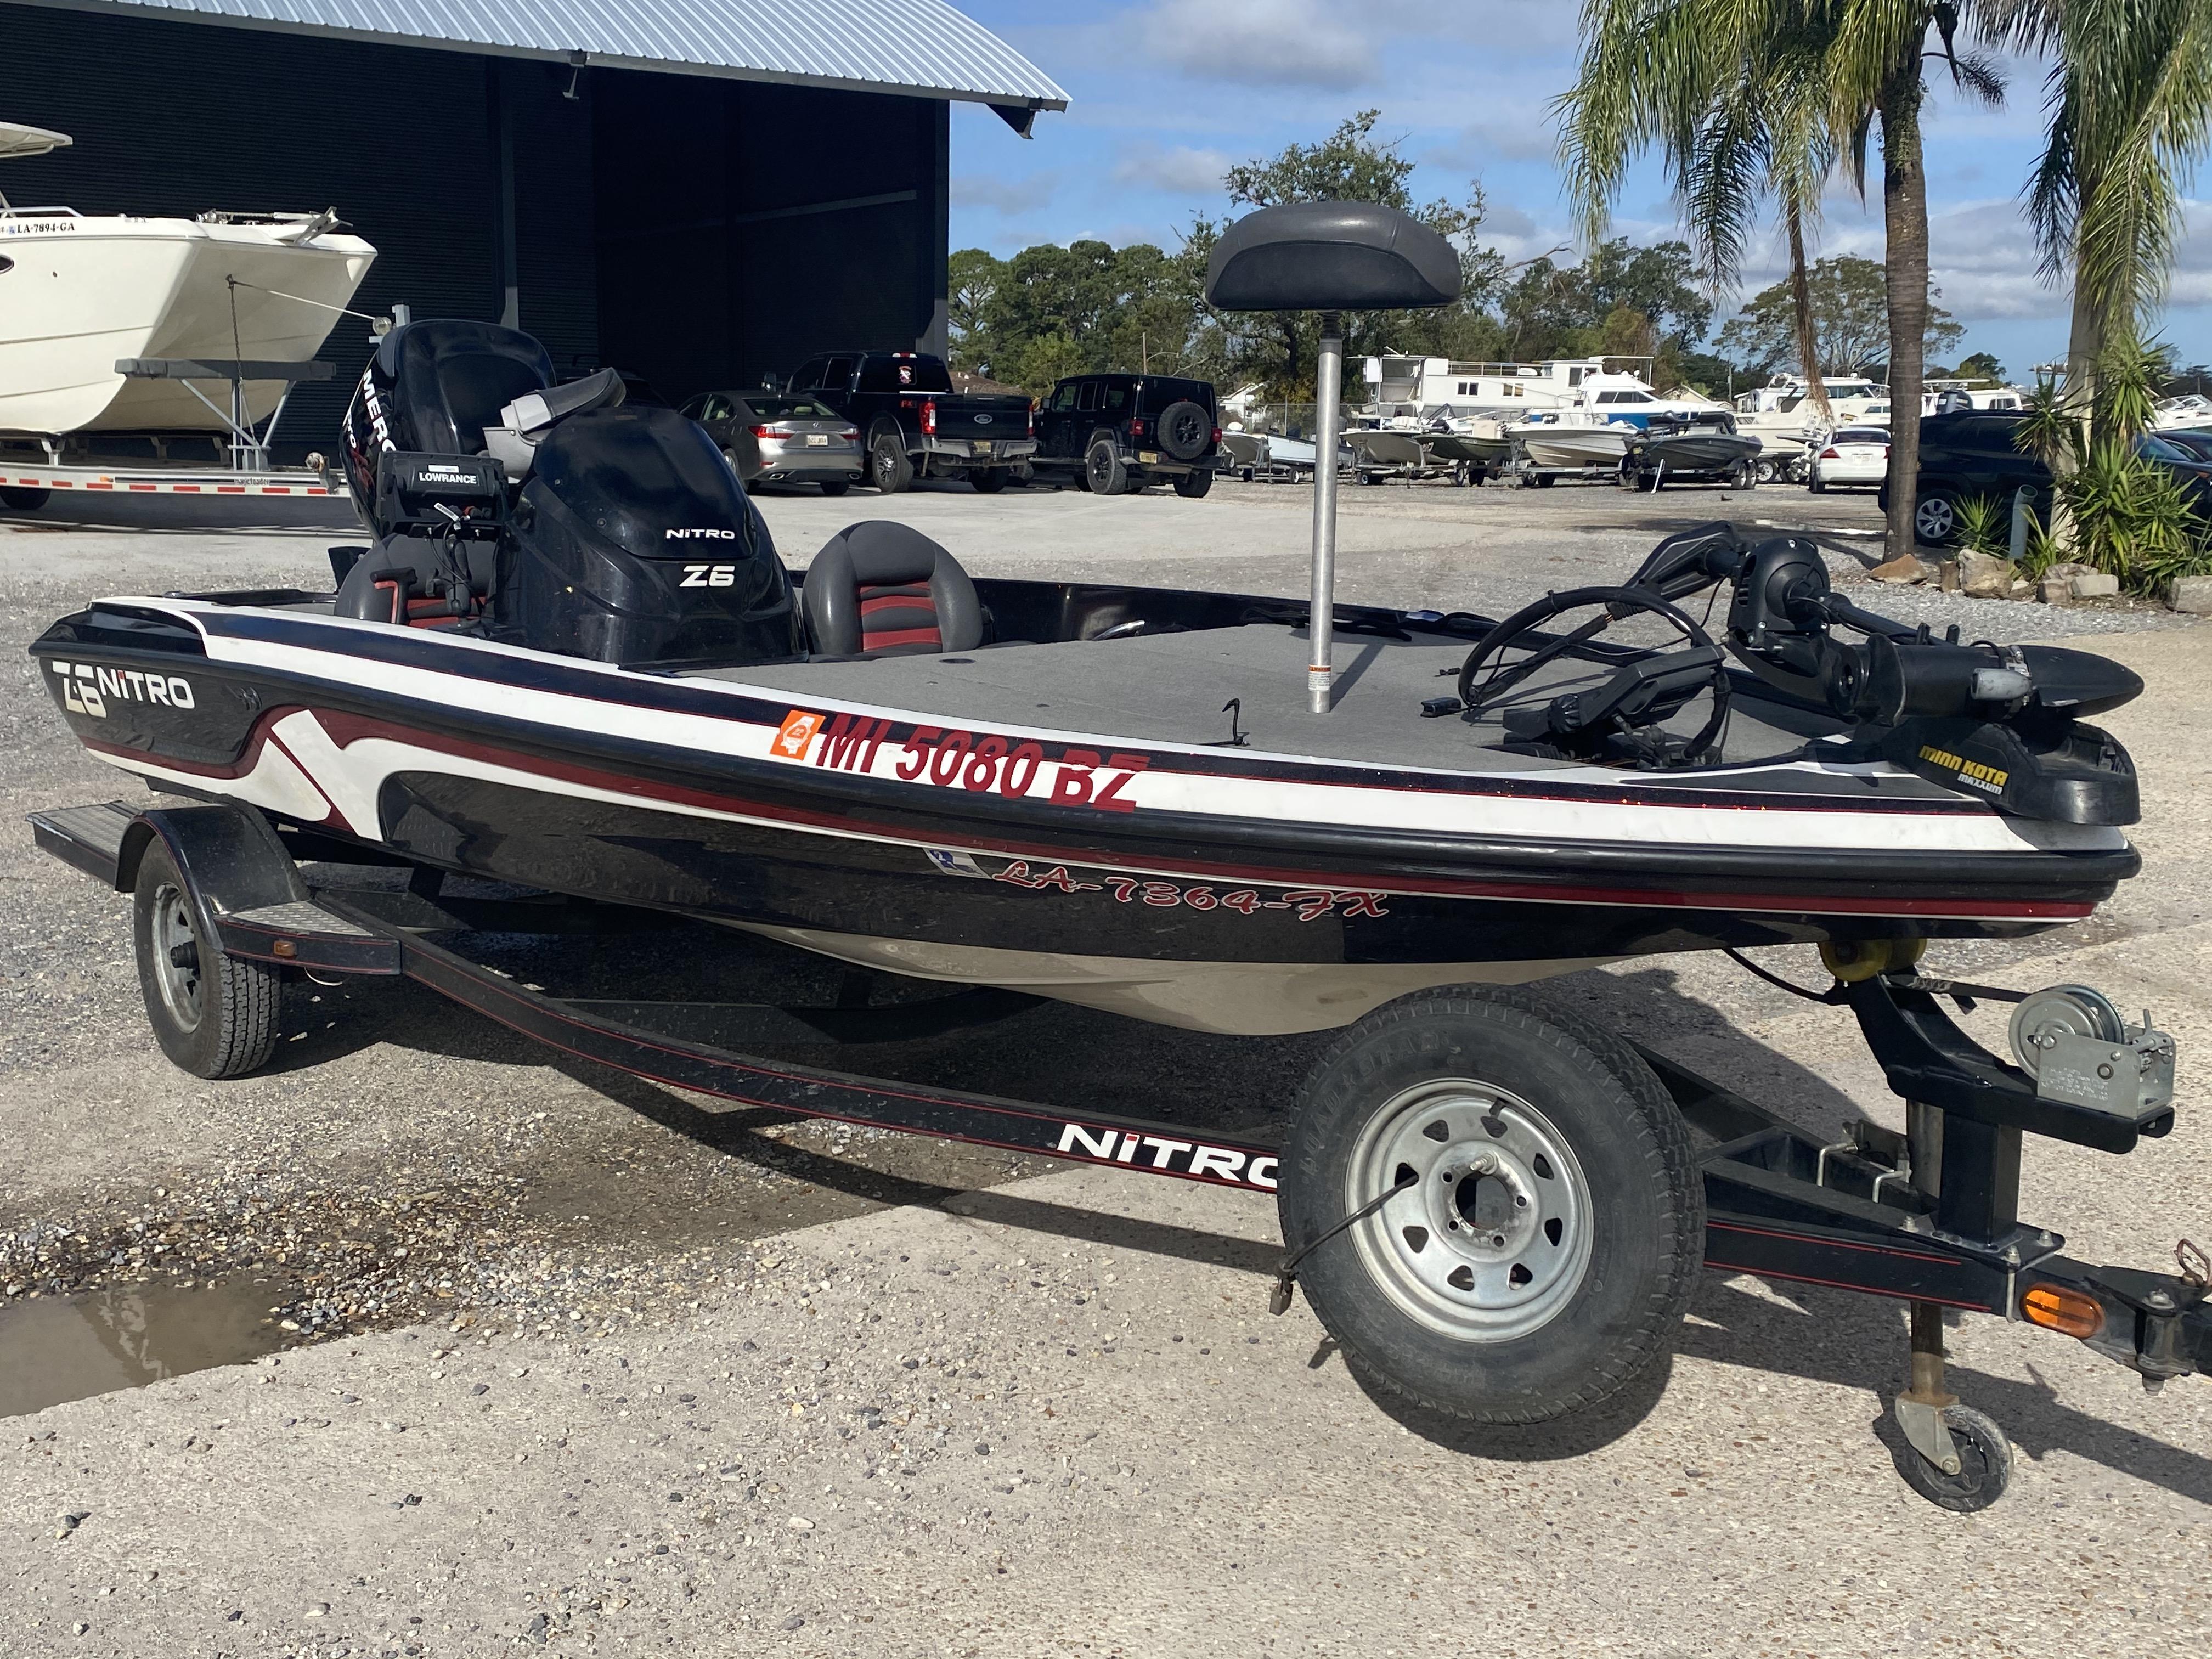 2011 Nitro boat for sale, model of the boat is Z6 & Image # 2 of 18